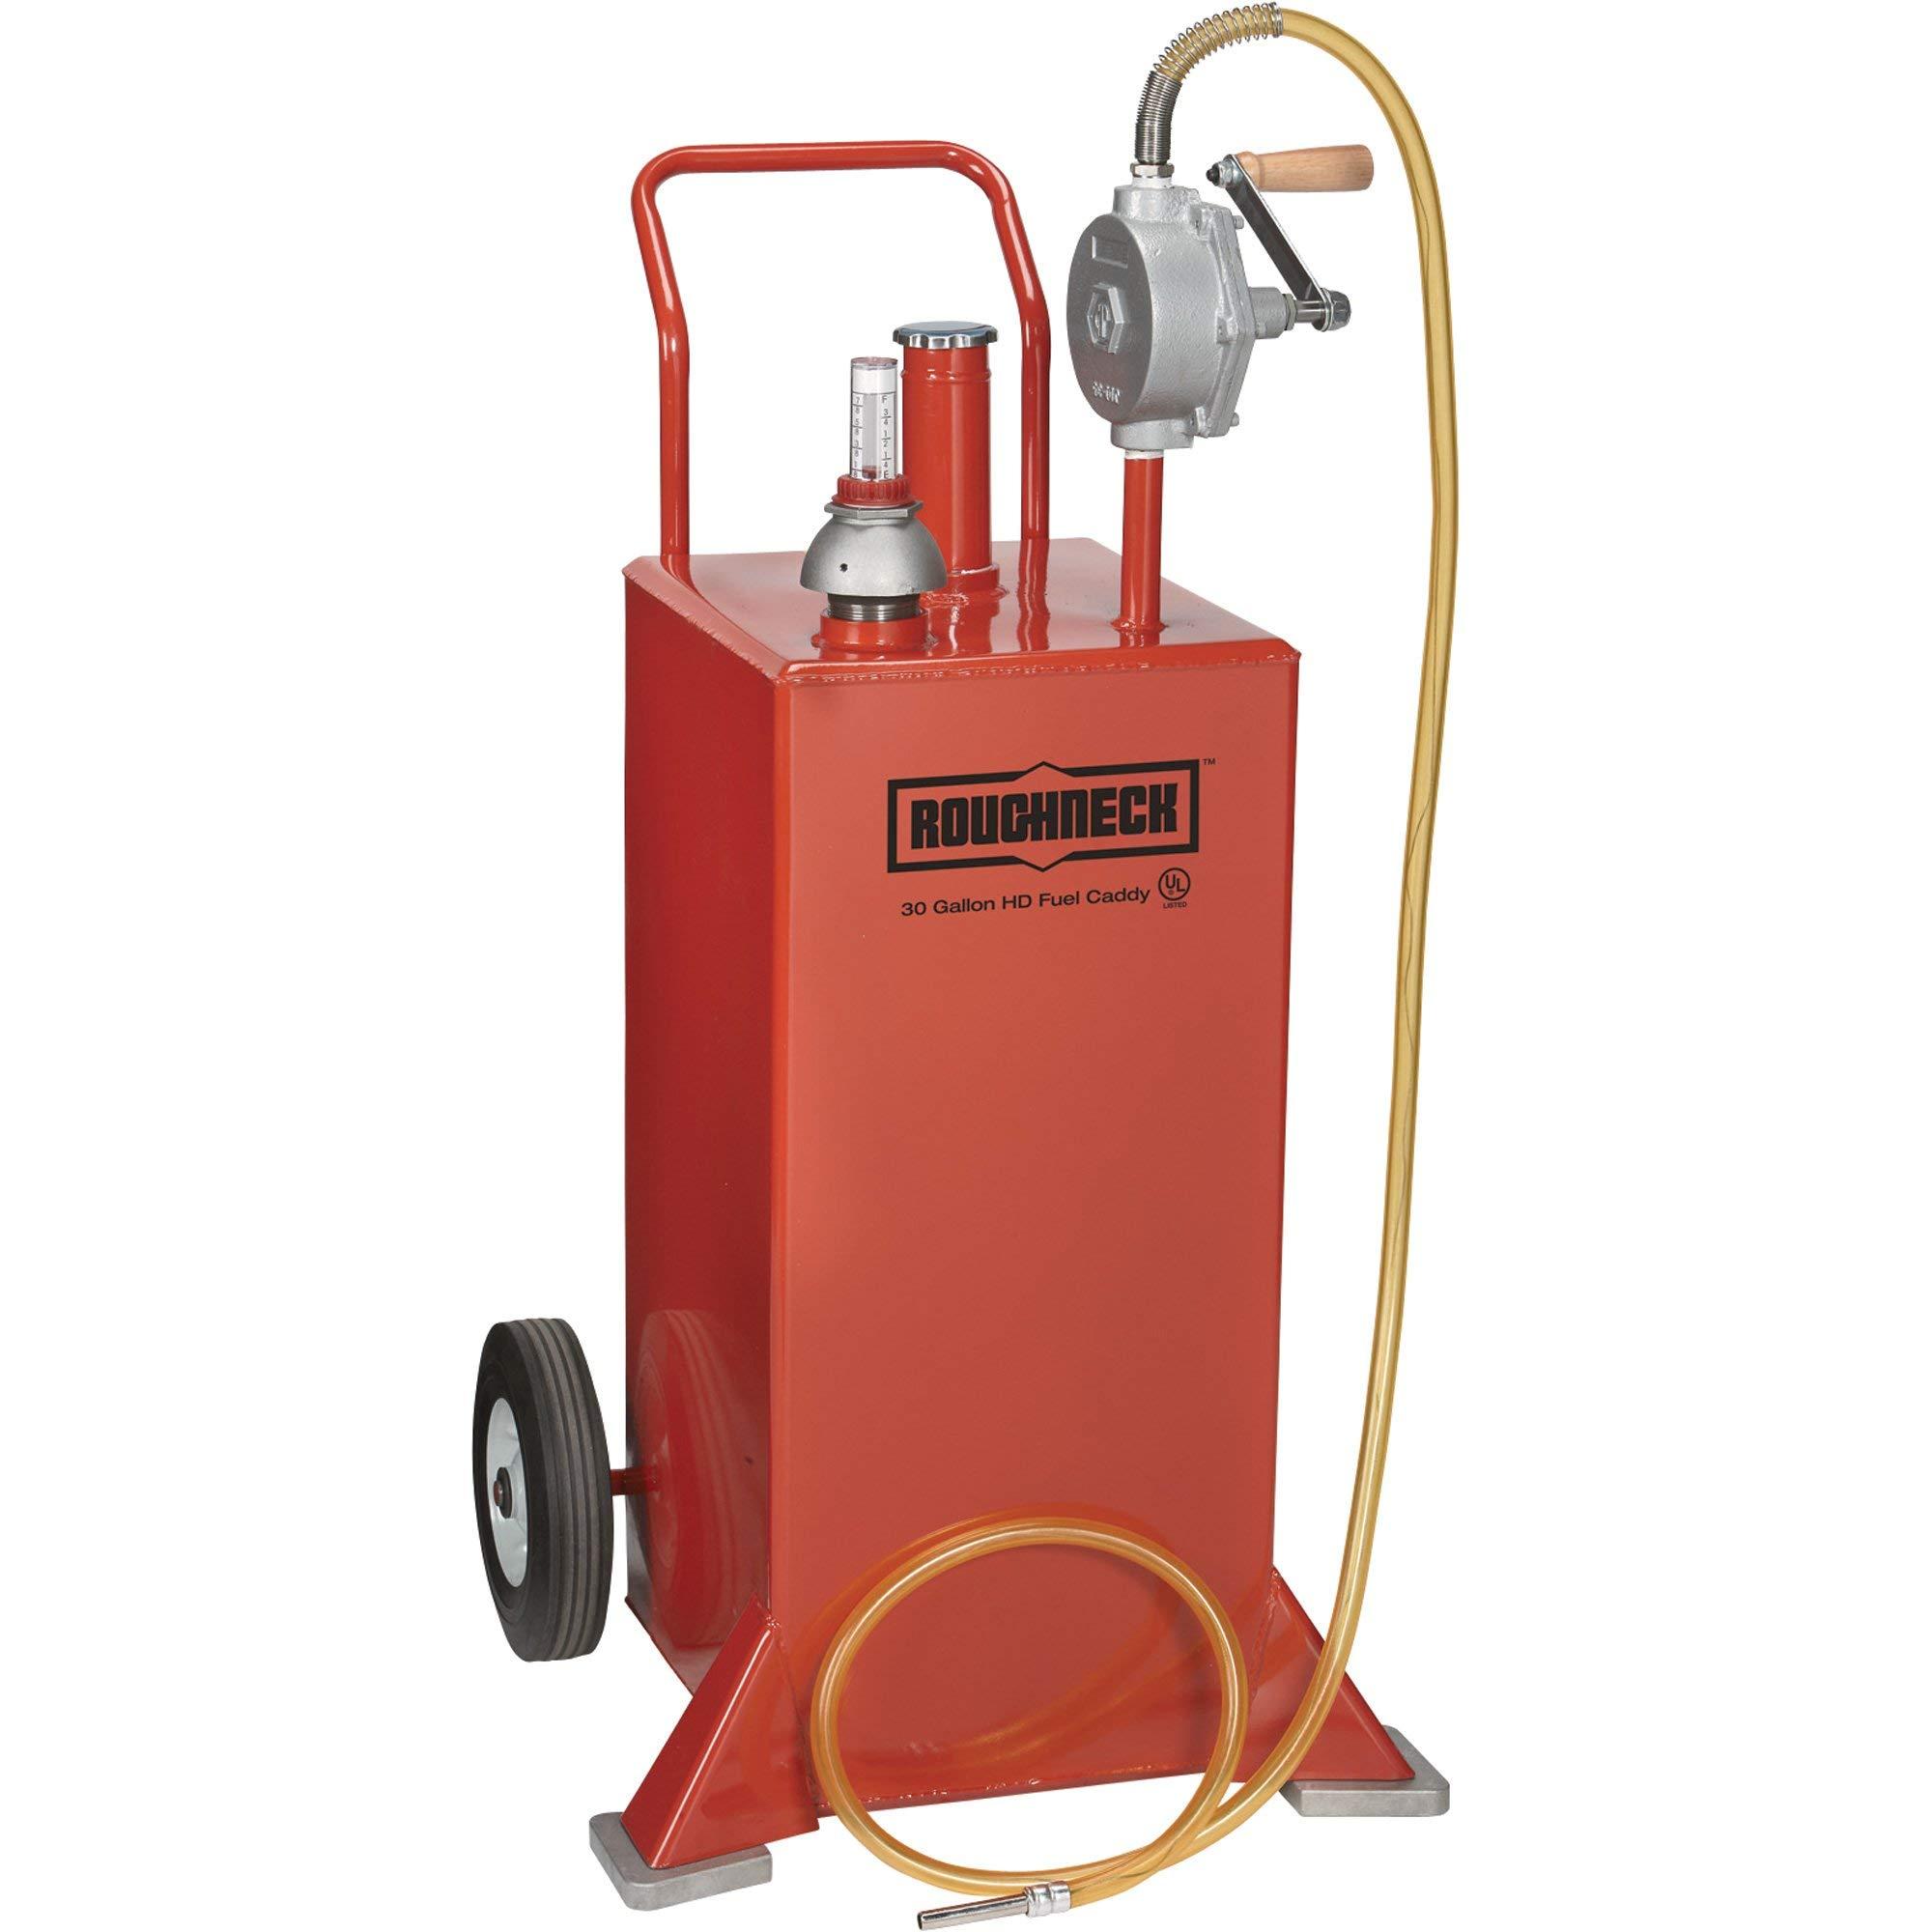 Roughneck UL Listed Gas Caddy - 30-Gallon, Steel